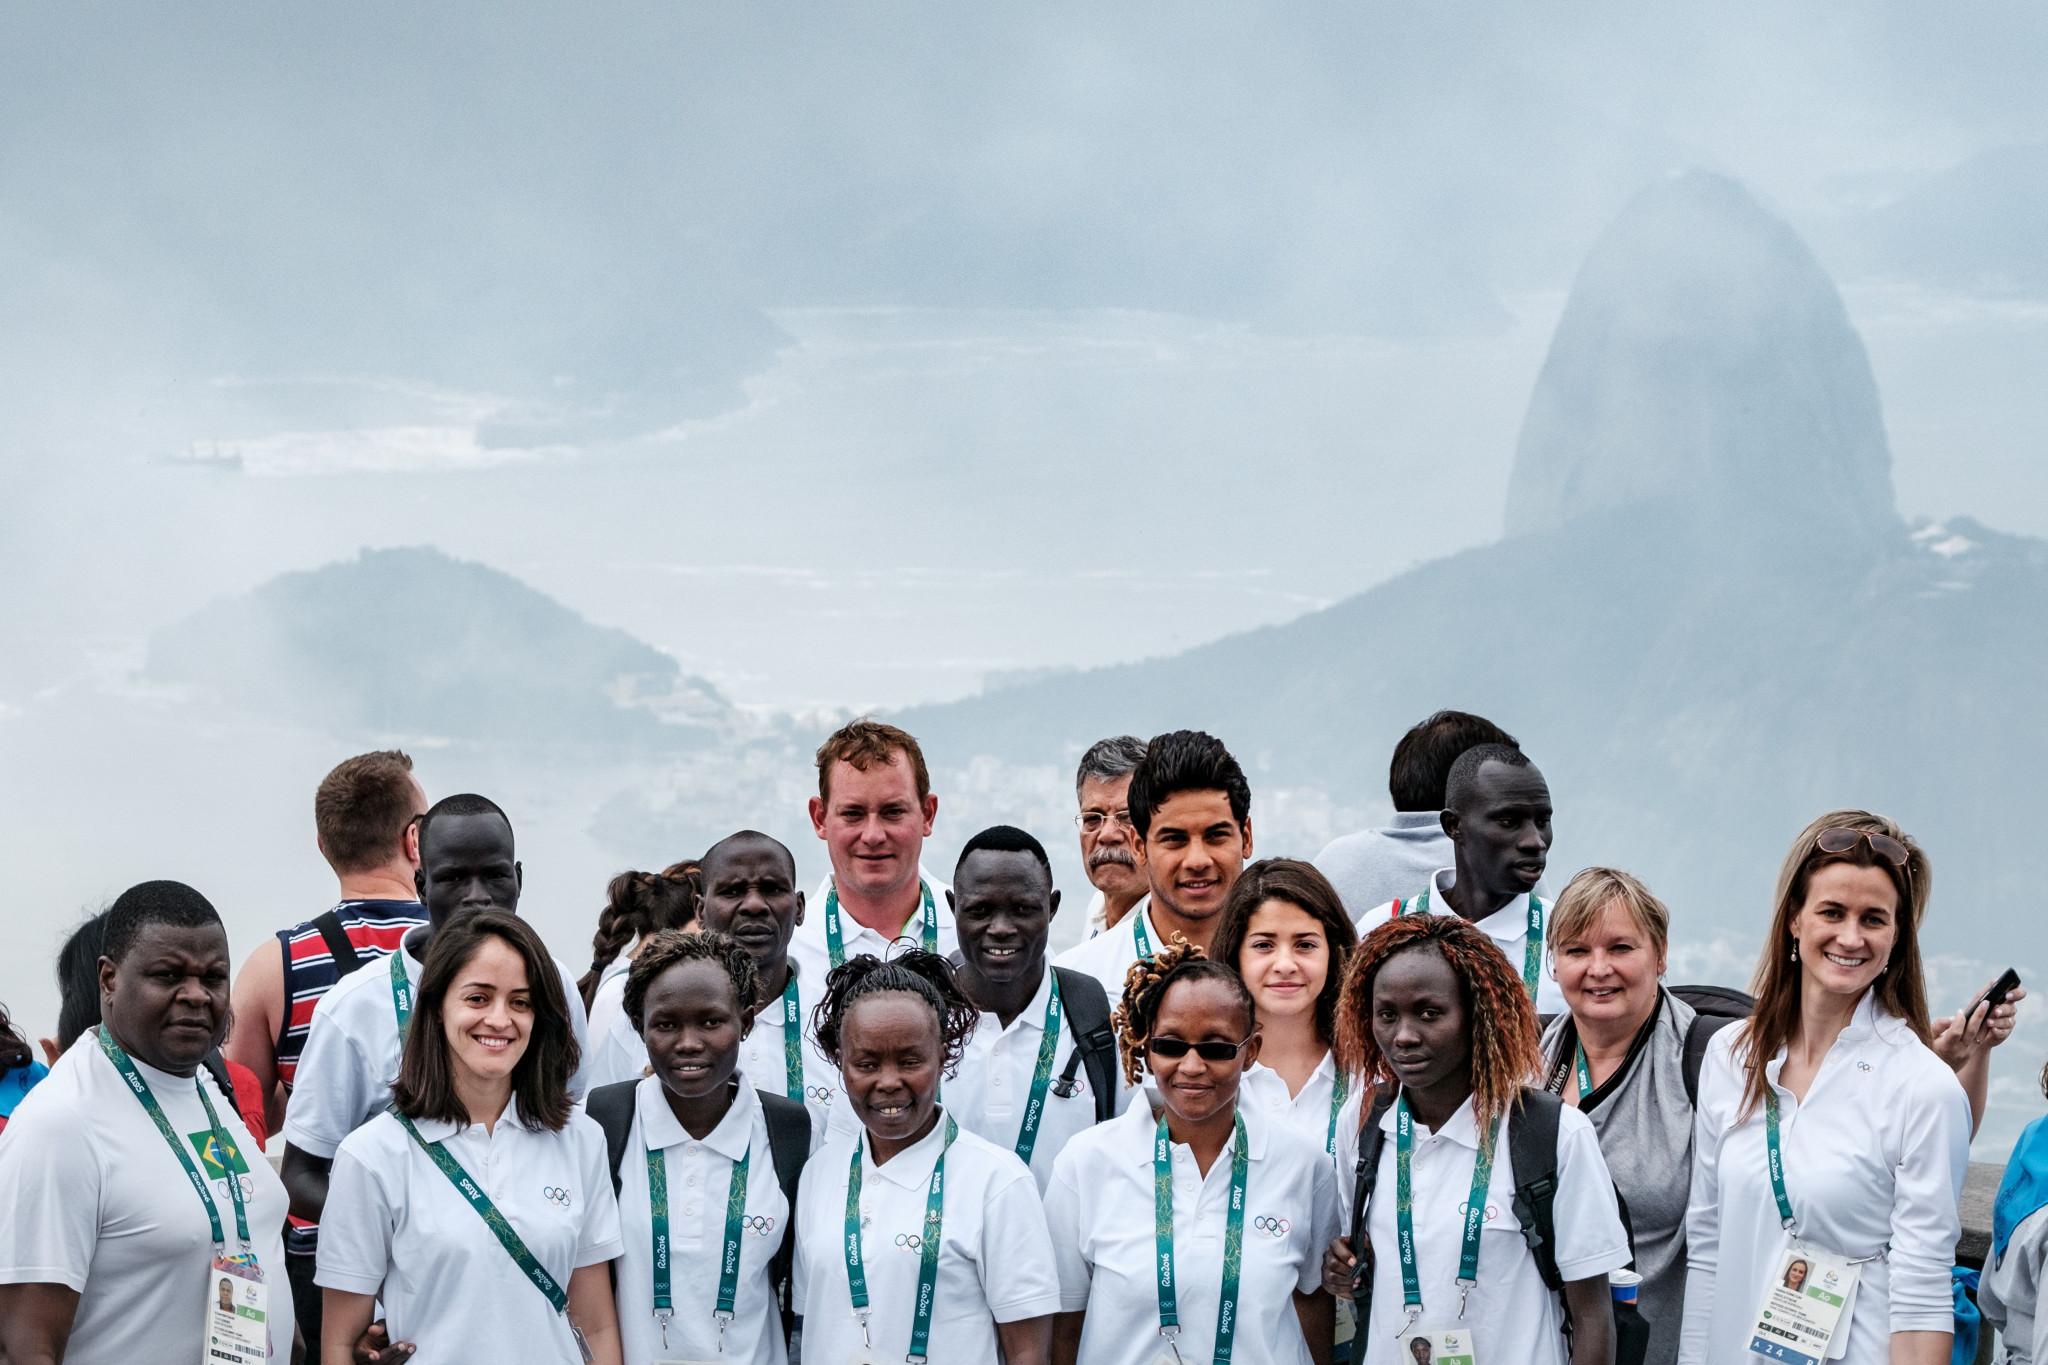 IOC Refugee Athlete Sediqi seeking Tokyo 2020 taekwondo goal